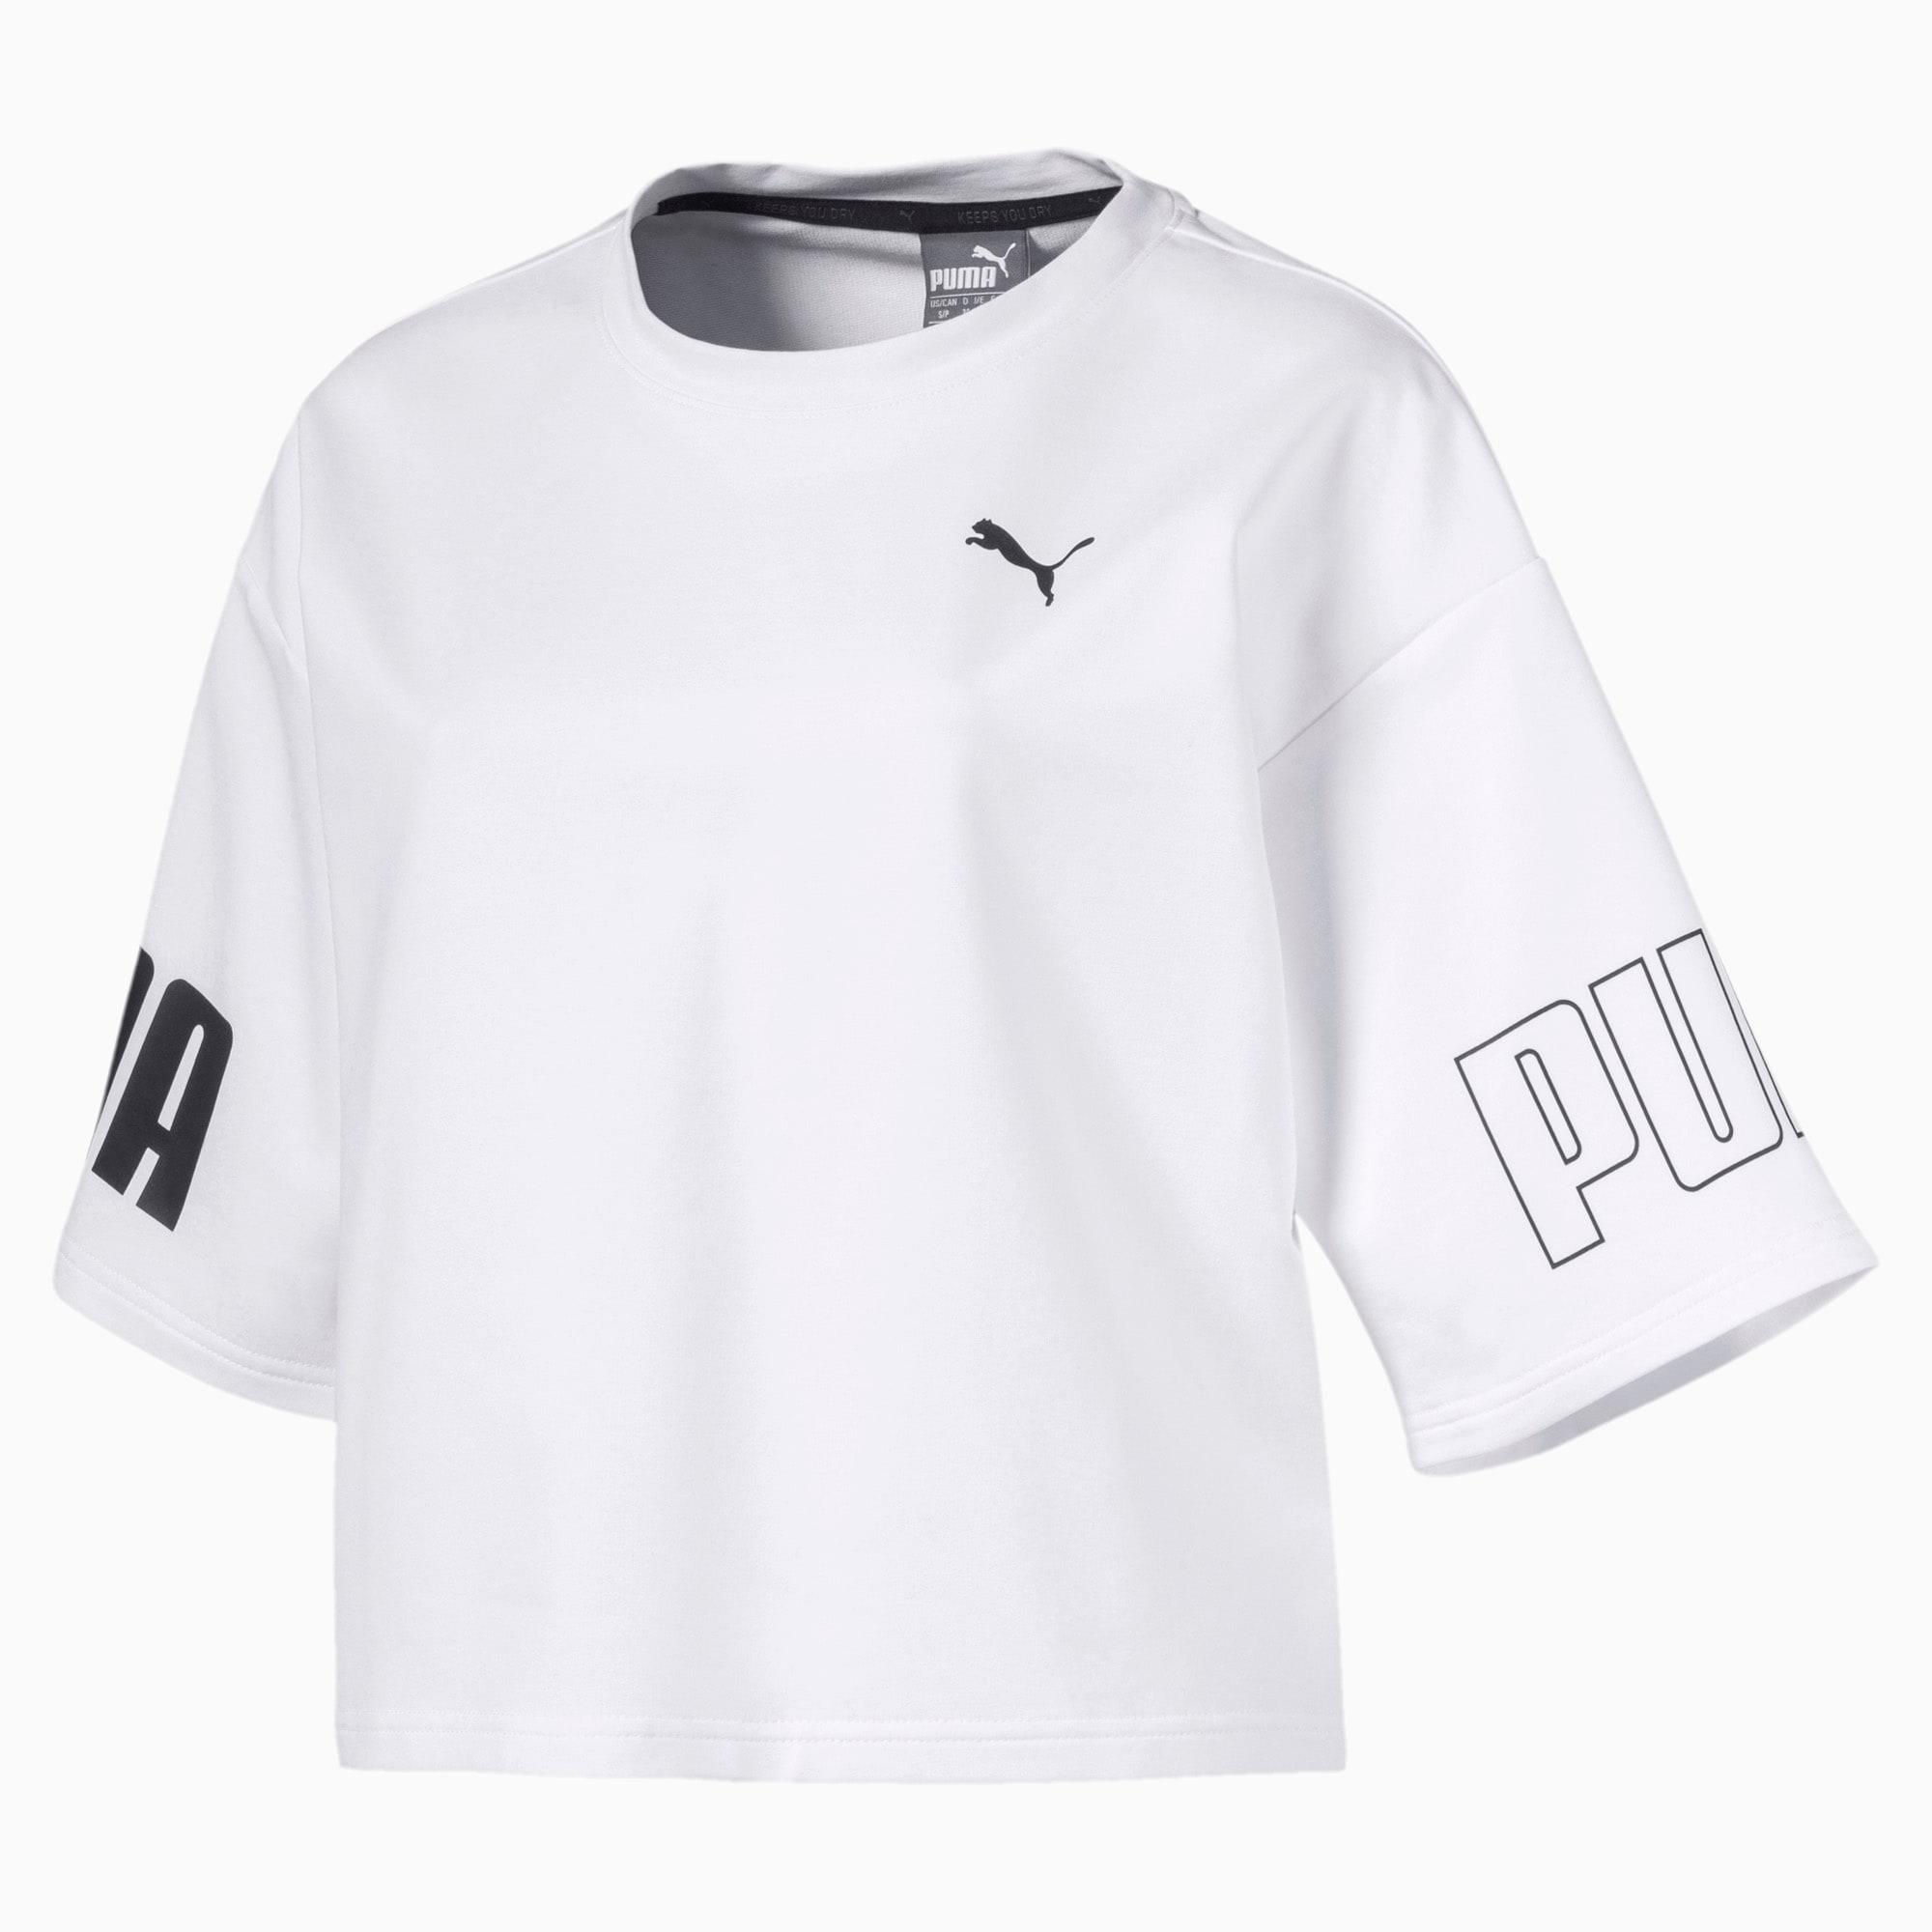 Modern Sport Damen Kurzes Sweat T Shirt | Puma White Black